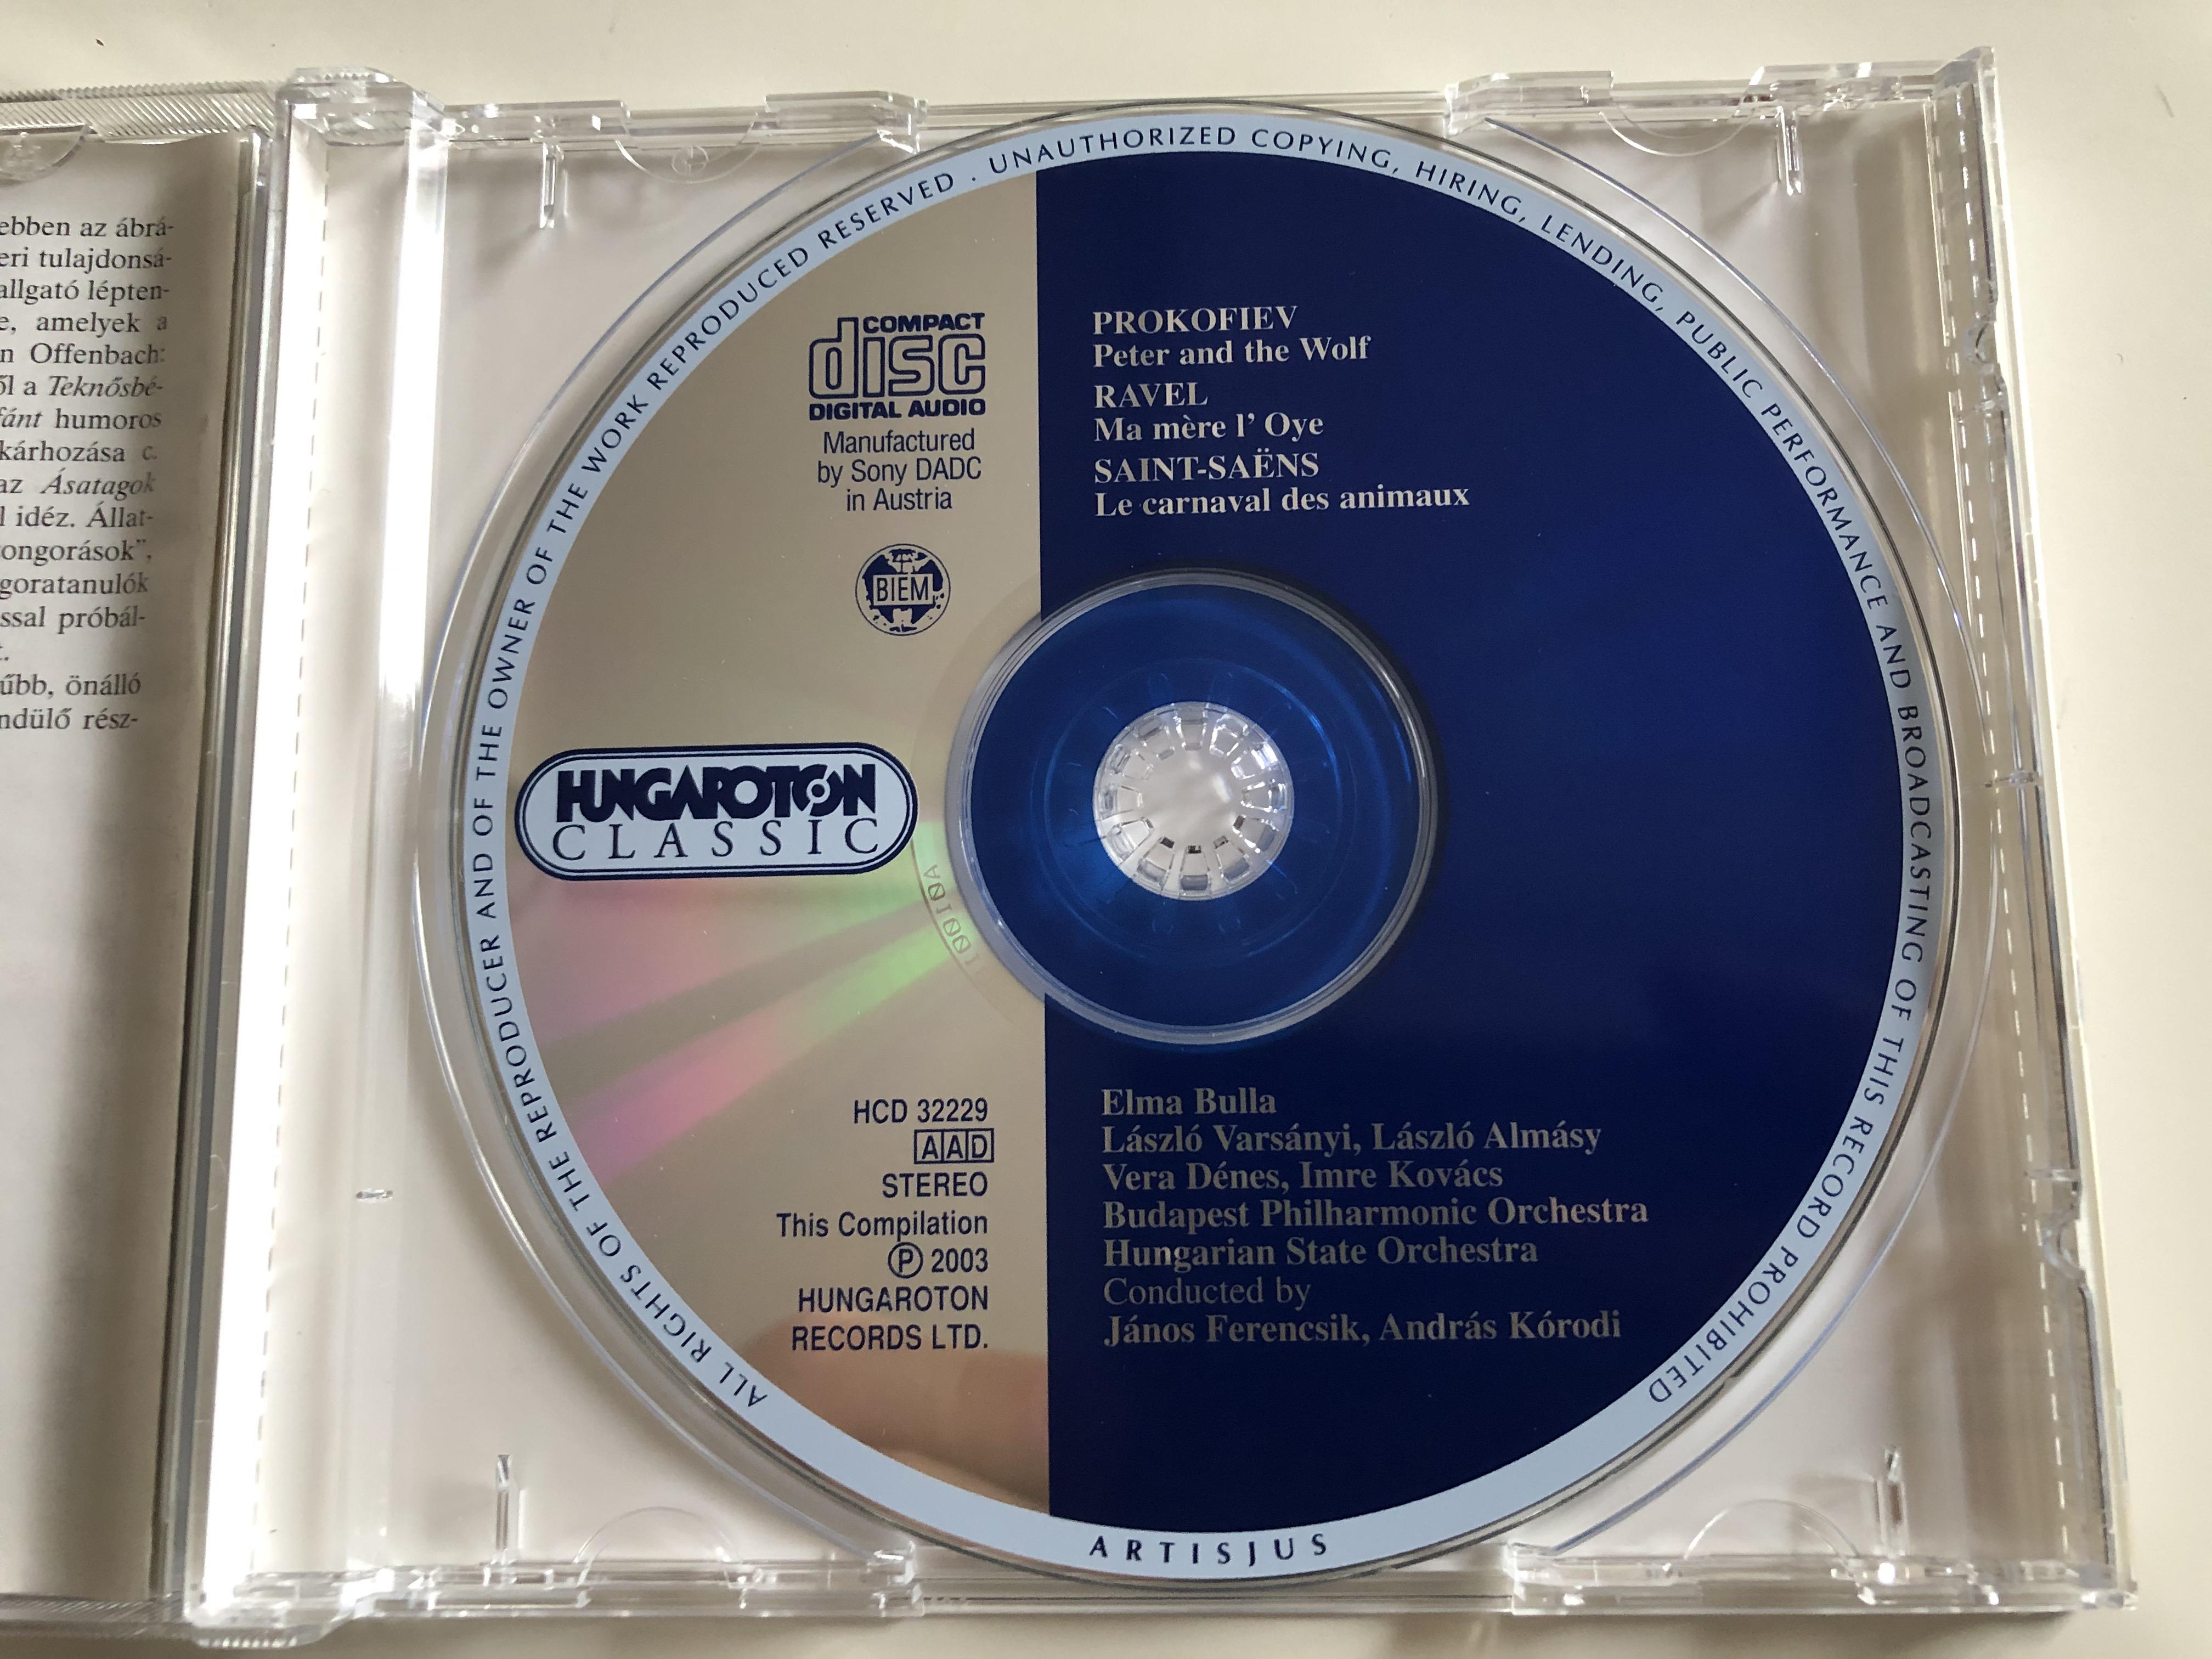 prokofiev-peter-and-the-wolf-saint-sa-ns-la-carnaval-des-animaux-ravel-ma-m-re-l-oye-hungaroton-classic-audio-cd-2003-stereo-hcd-32229-7-.jpg